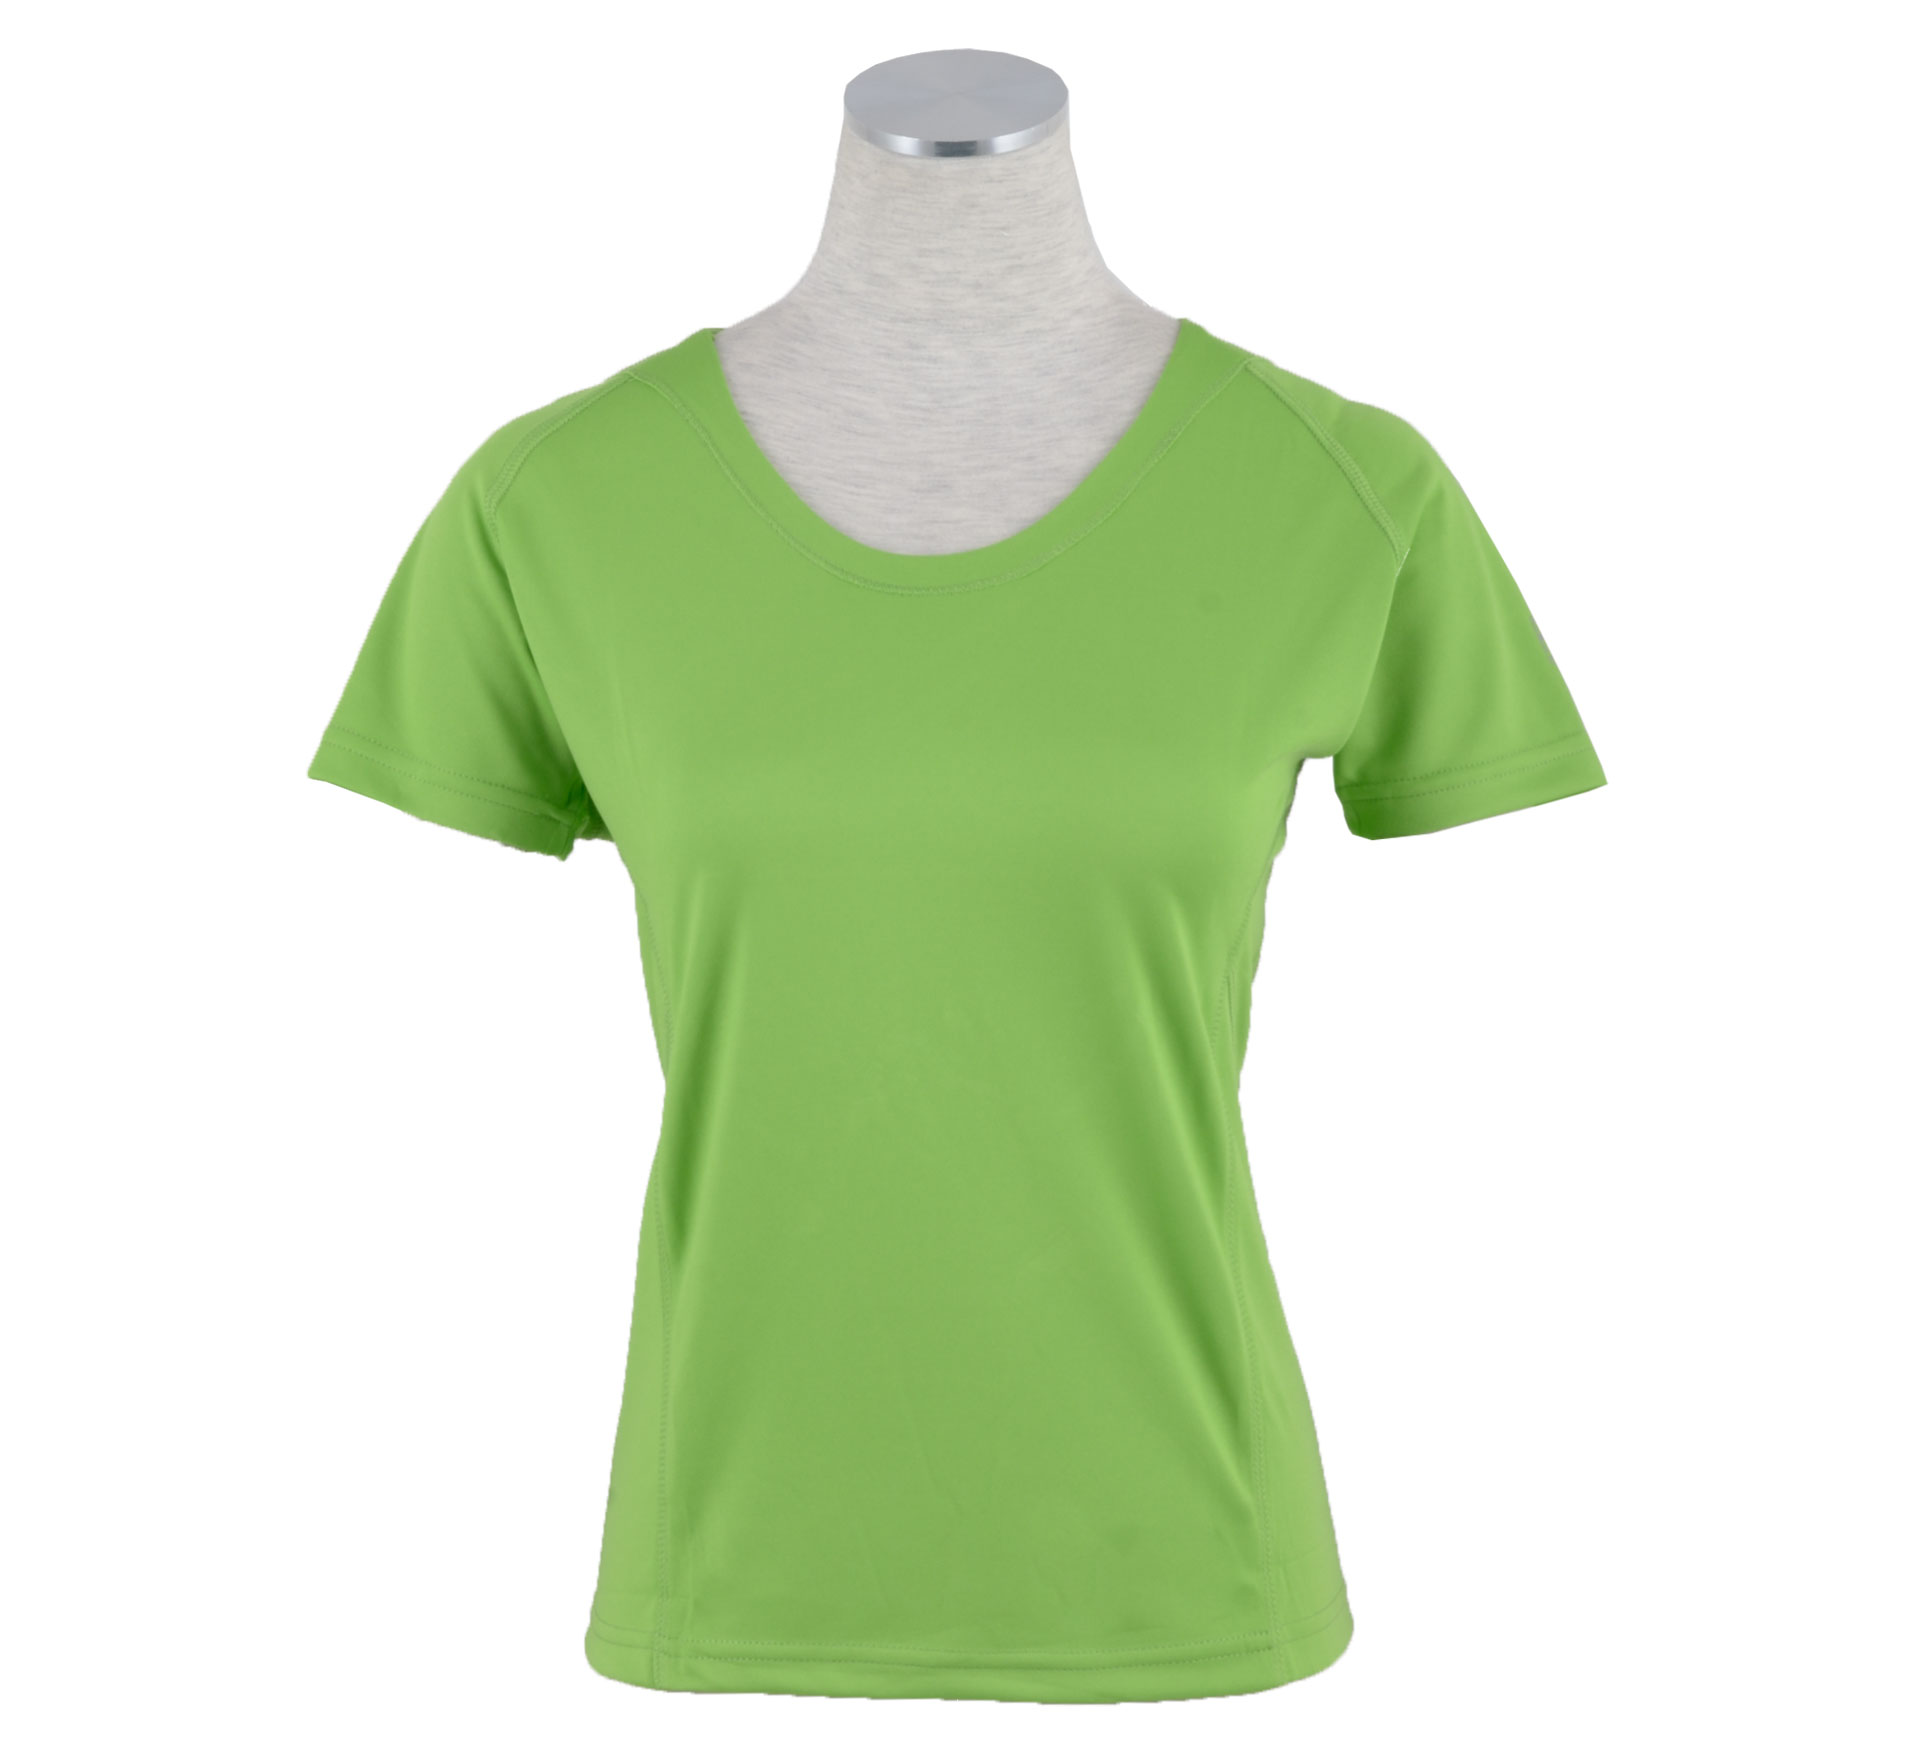 Avento  Sportshirt Dames lime groen